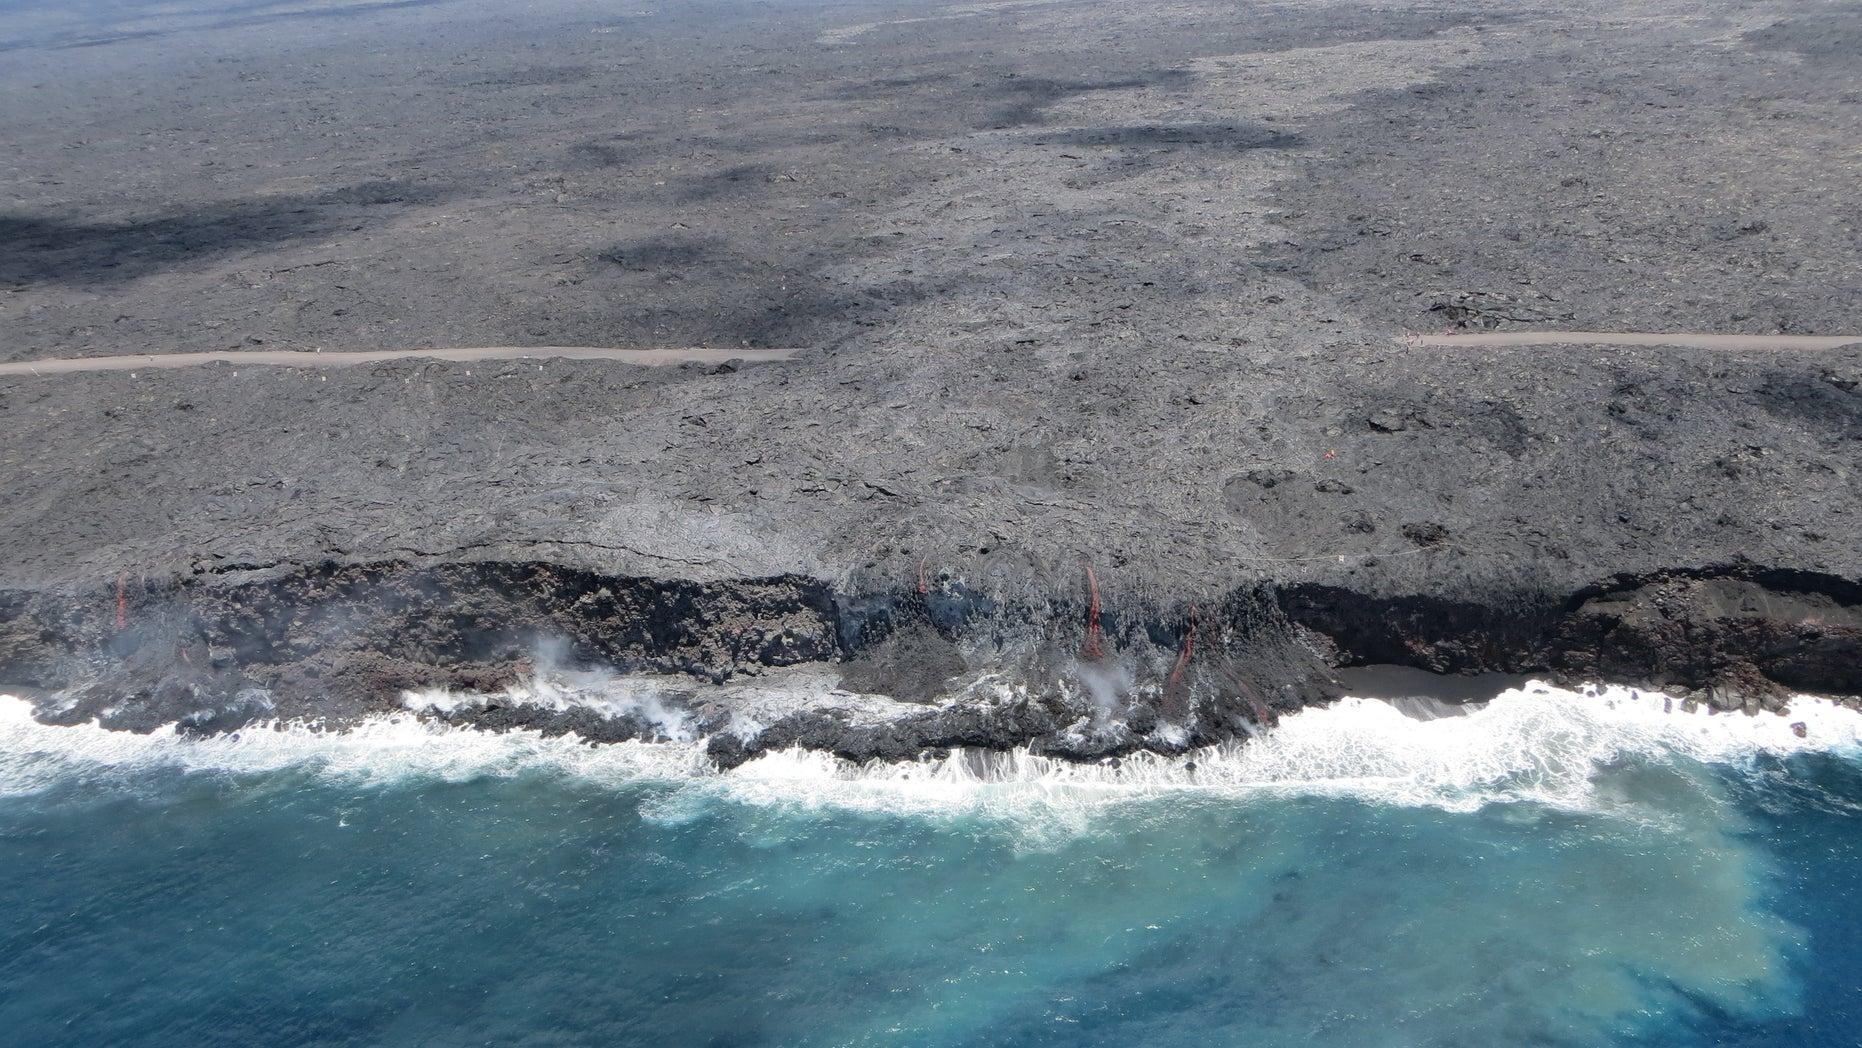 (Hawaii Volcano Observatory - USGS)